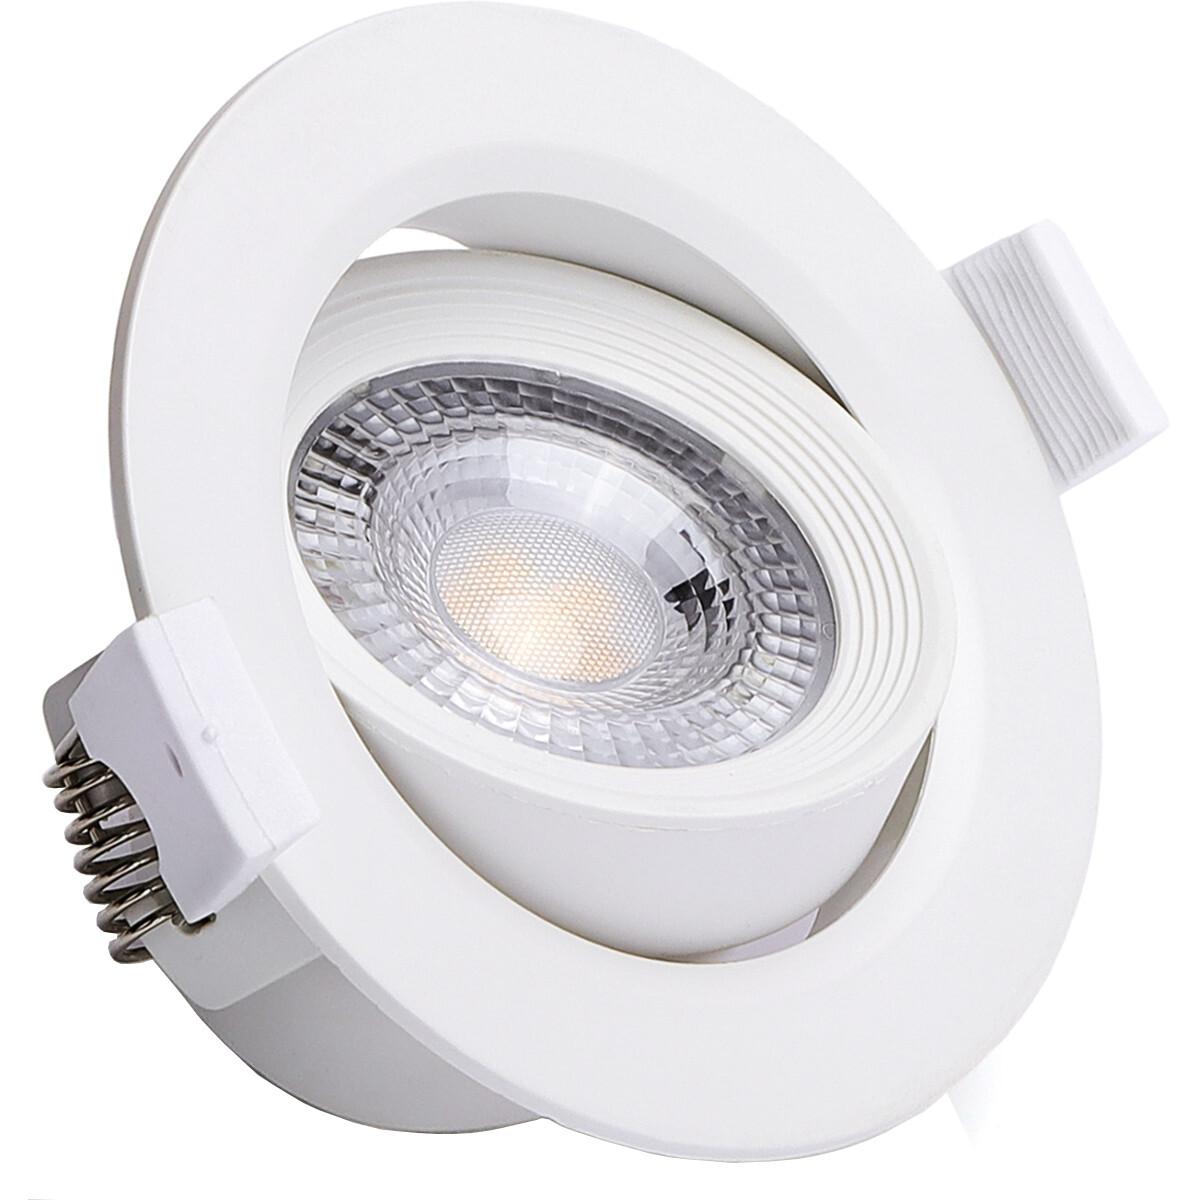 LED Spot - Inbouwspot - Aigi Nilona - 5W - Warm Wit 3000K - Rond - Kantelbaar - Mat Wit - Aluminium